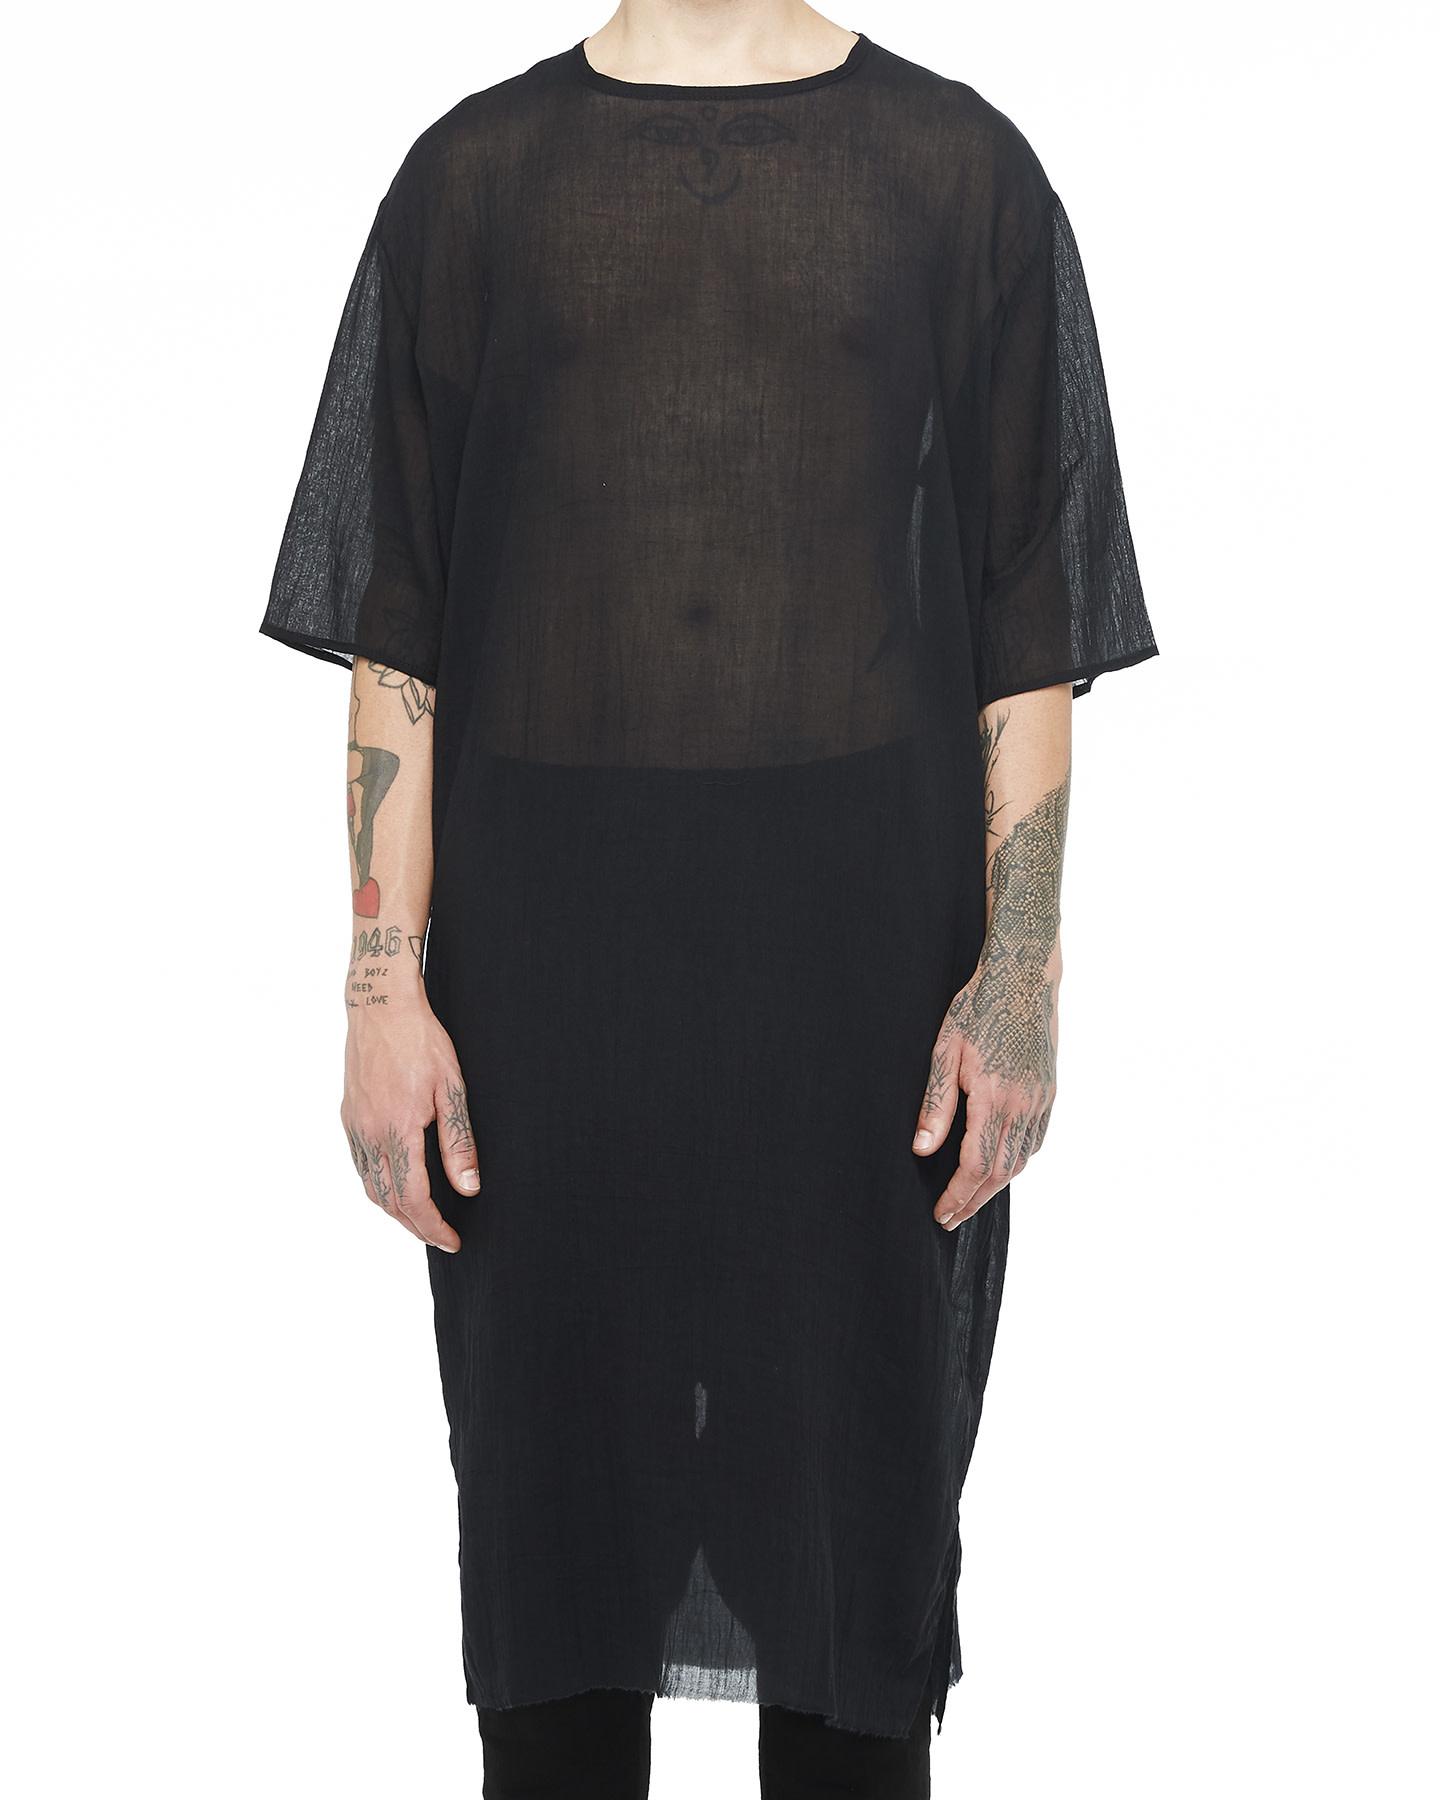 WASHED COTTON GAUZE KAFTAN T-SHIRT - BLACK